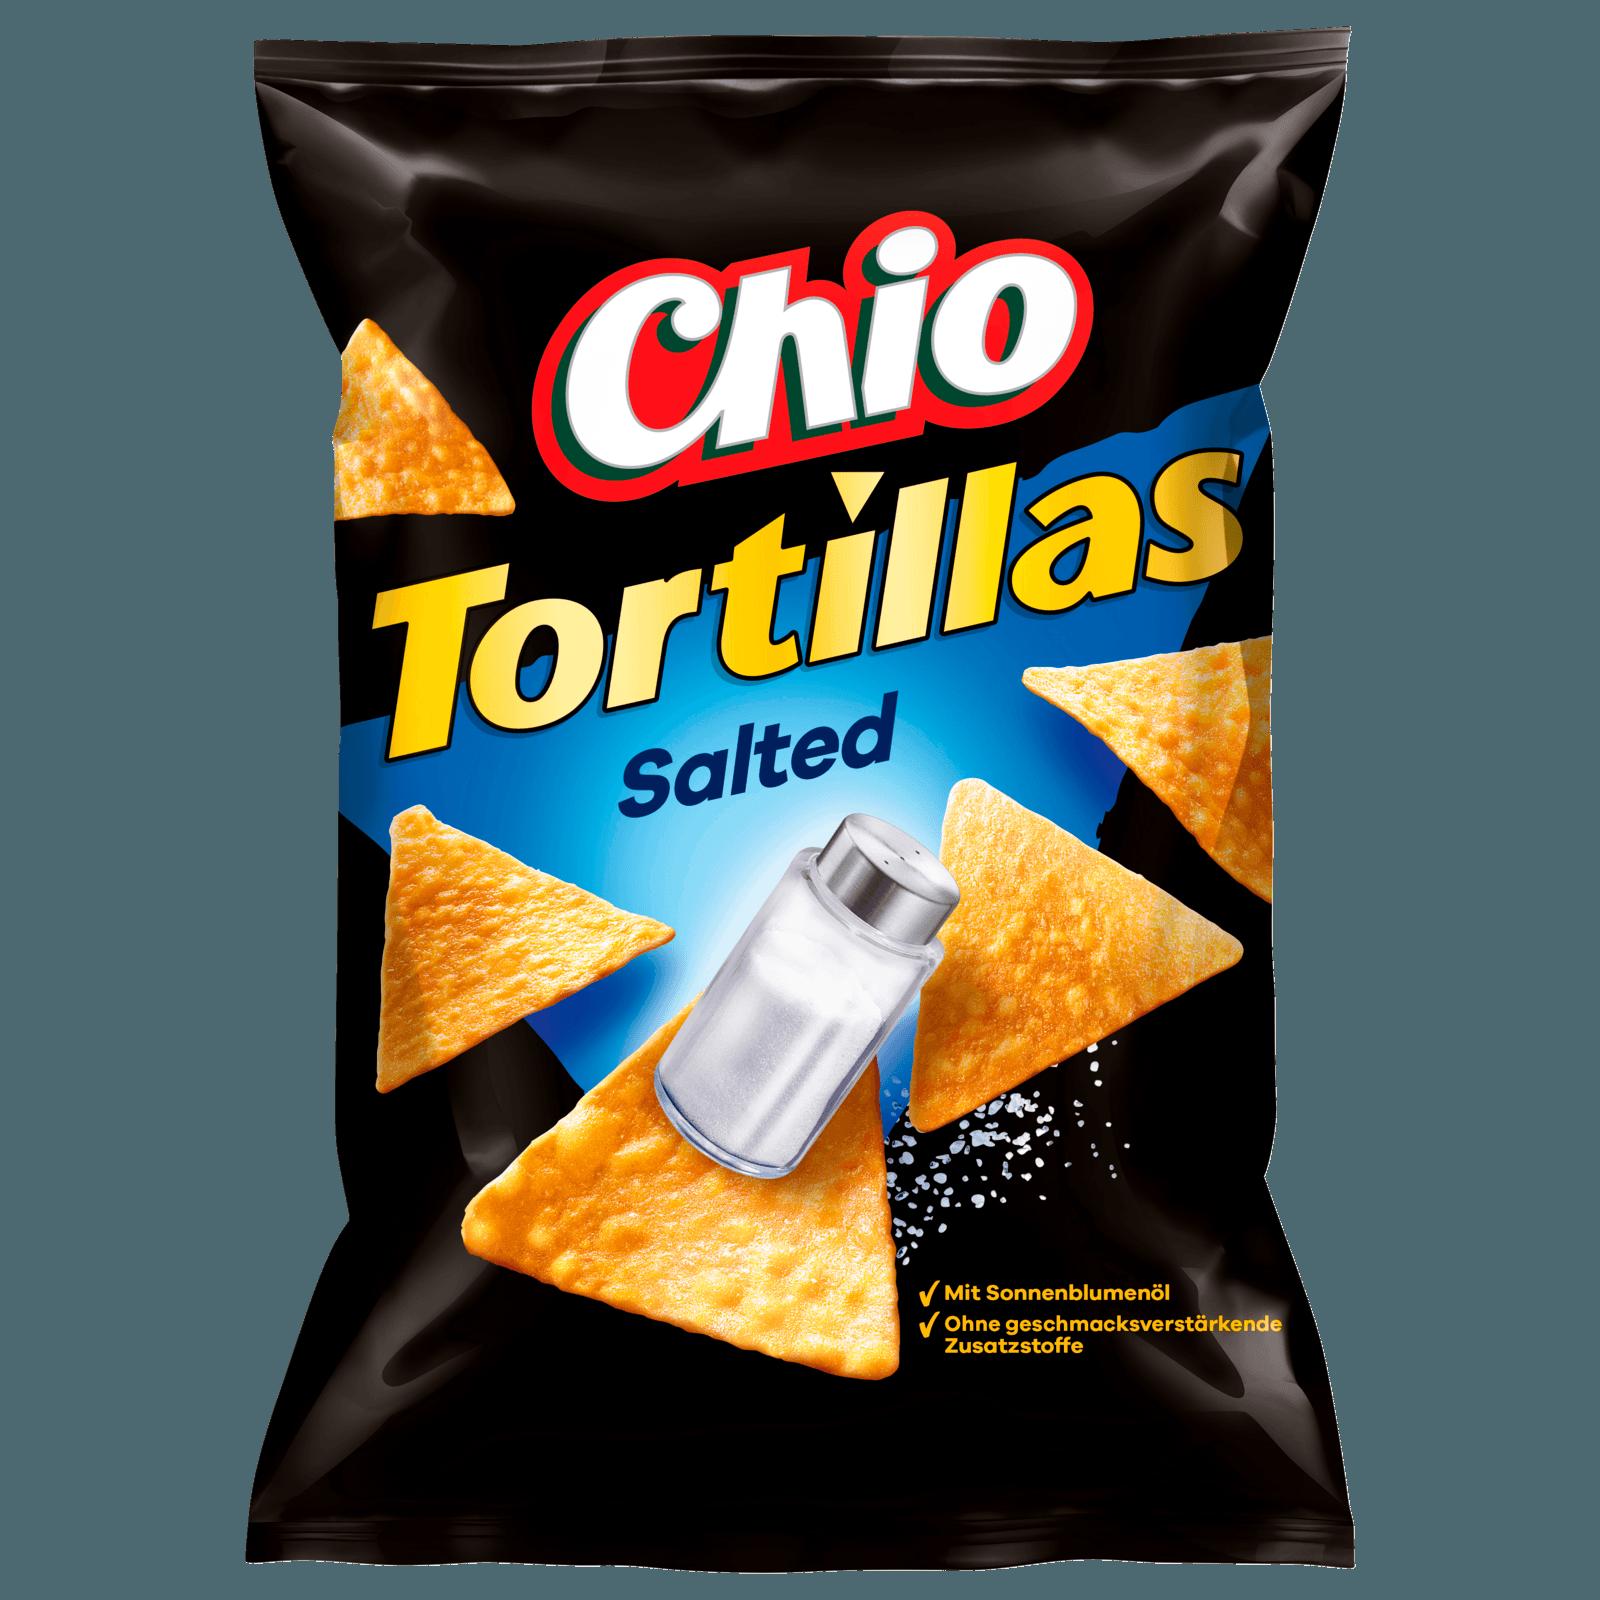 Chio Tortilla Chips Original Salted 125g